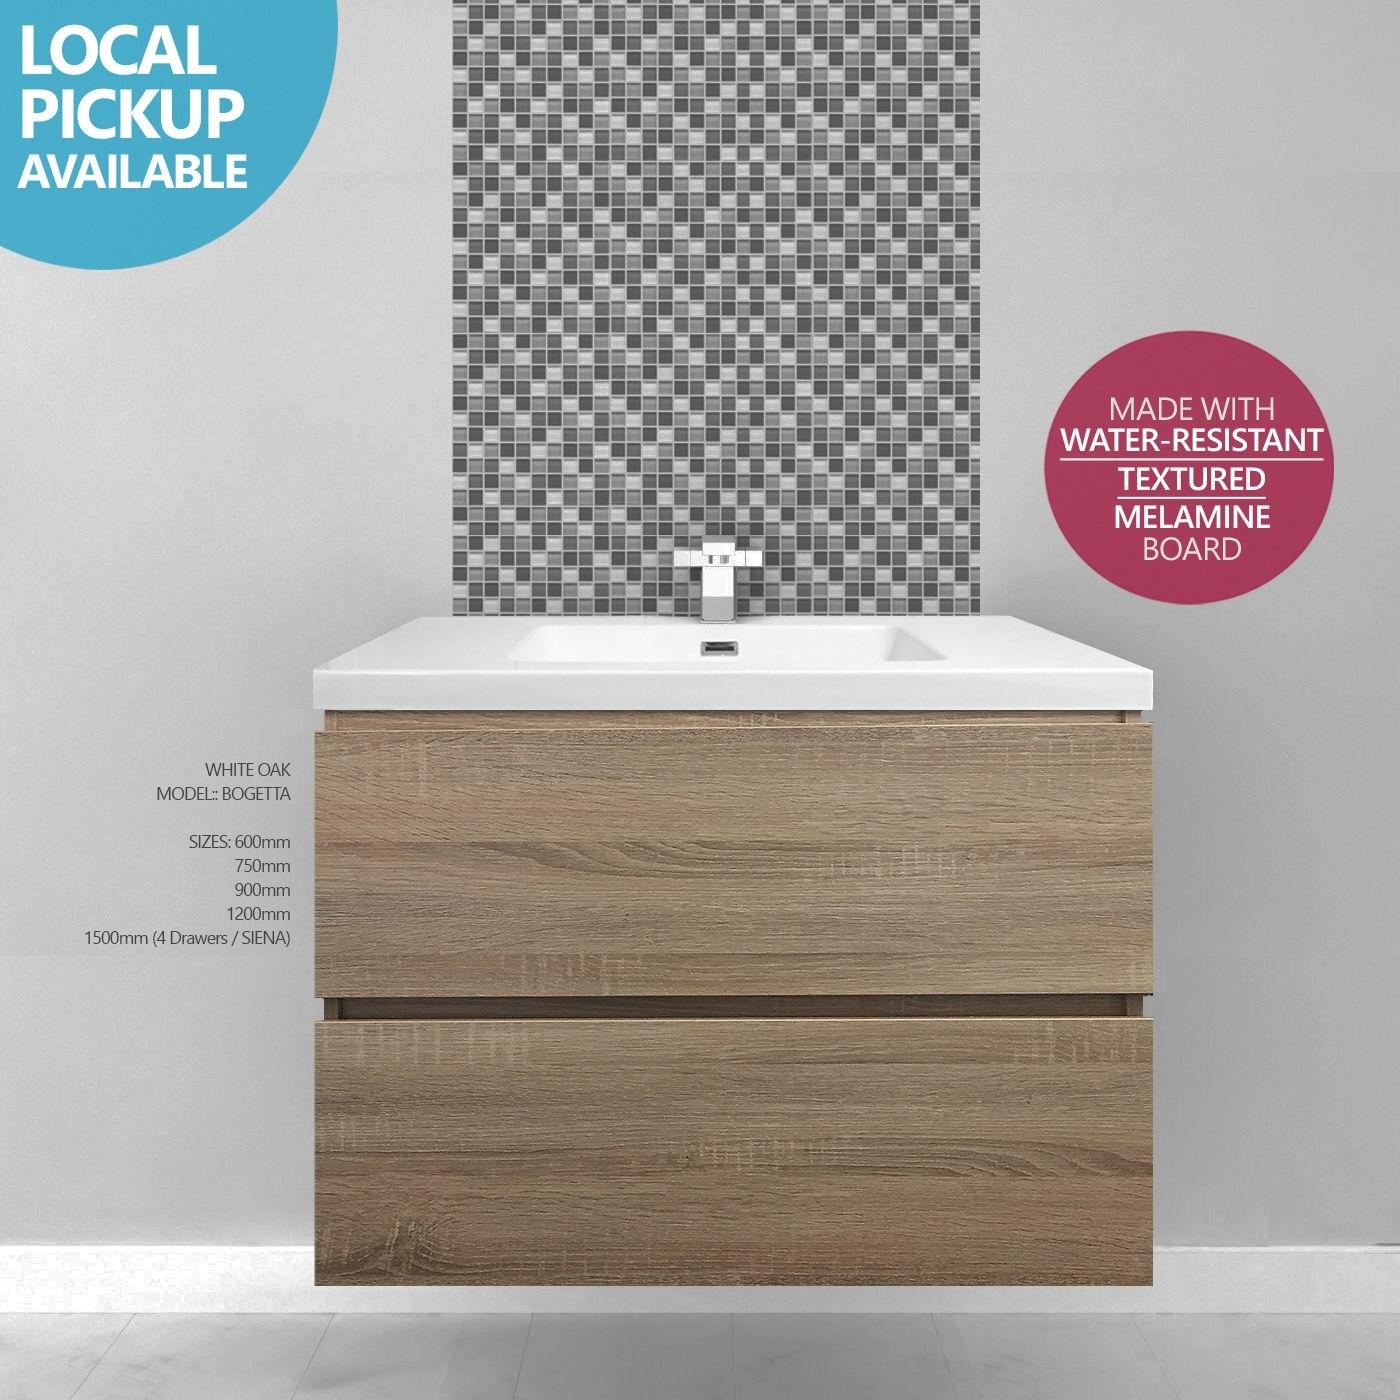 Bogetta 900mm Plywood Or Standard White Oak Timber Wood Grain Wall Hung Freestanding Bathroom Vanity